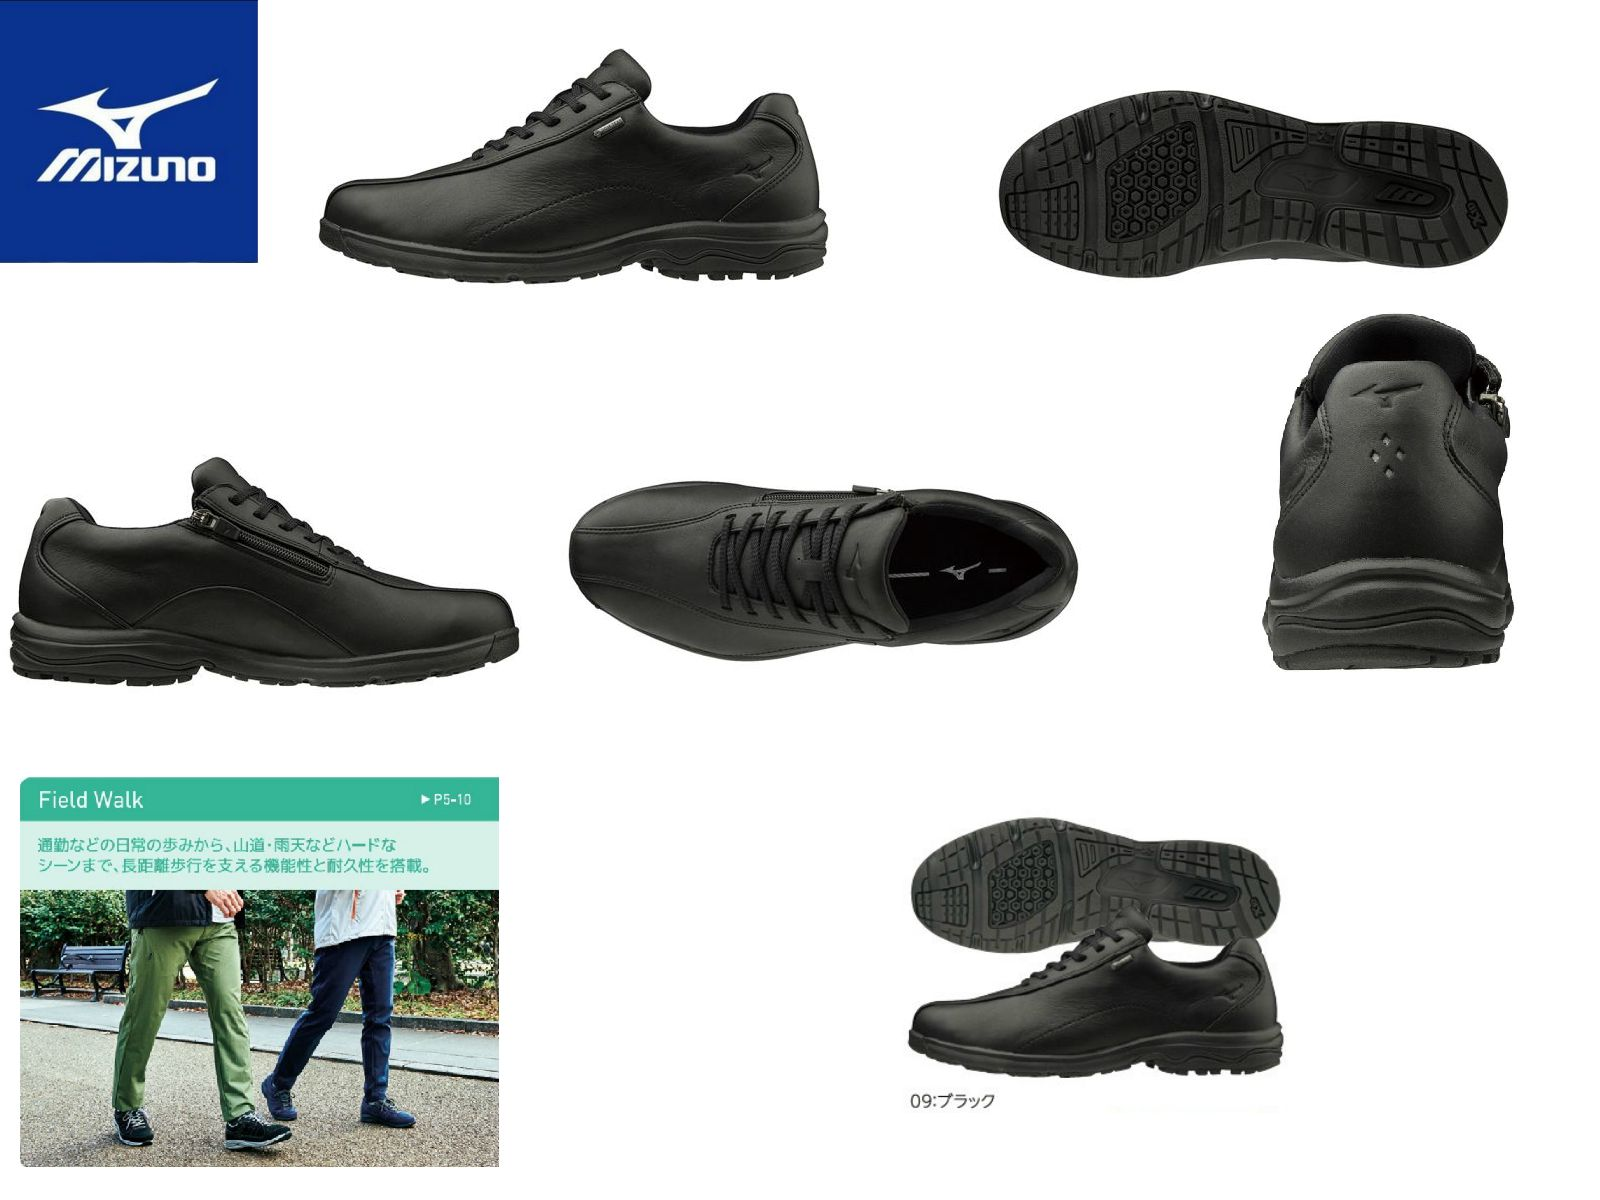 【MIZUNO = ミズノ】ウォーキング 散歩 通勤 通学 遠足 ハイキング 散策ウォーキングシューズ 靴【LD40Vα(ウォーキング)[レディース][3E]】[Field Walk:長距離ウォーキング](21.5~24.5cm)[ブラック]